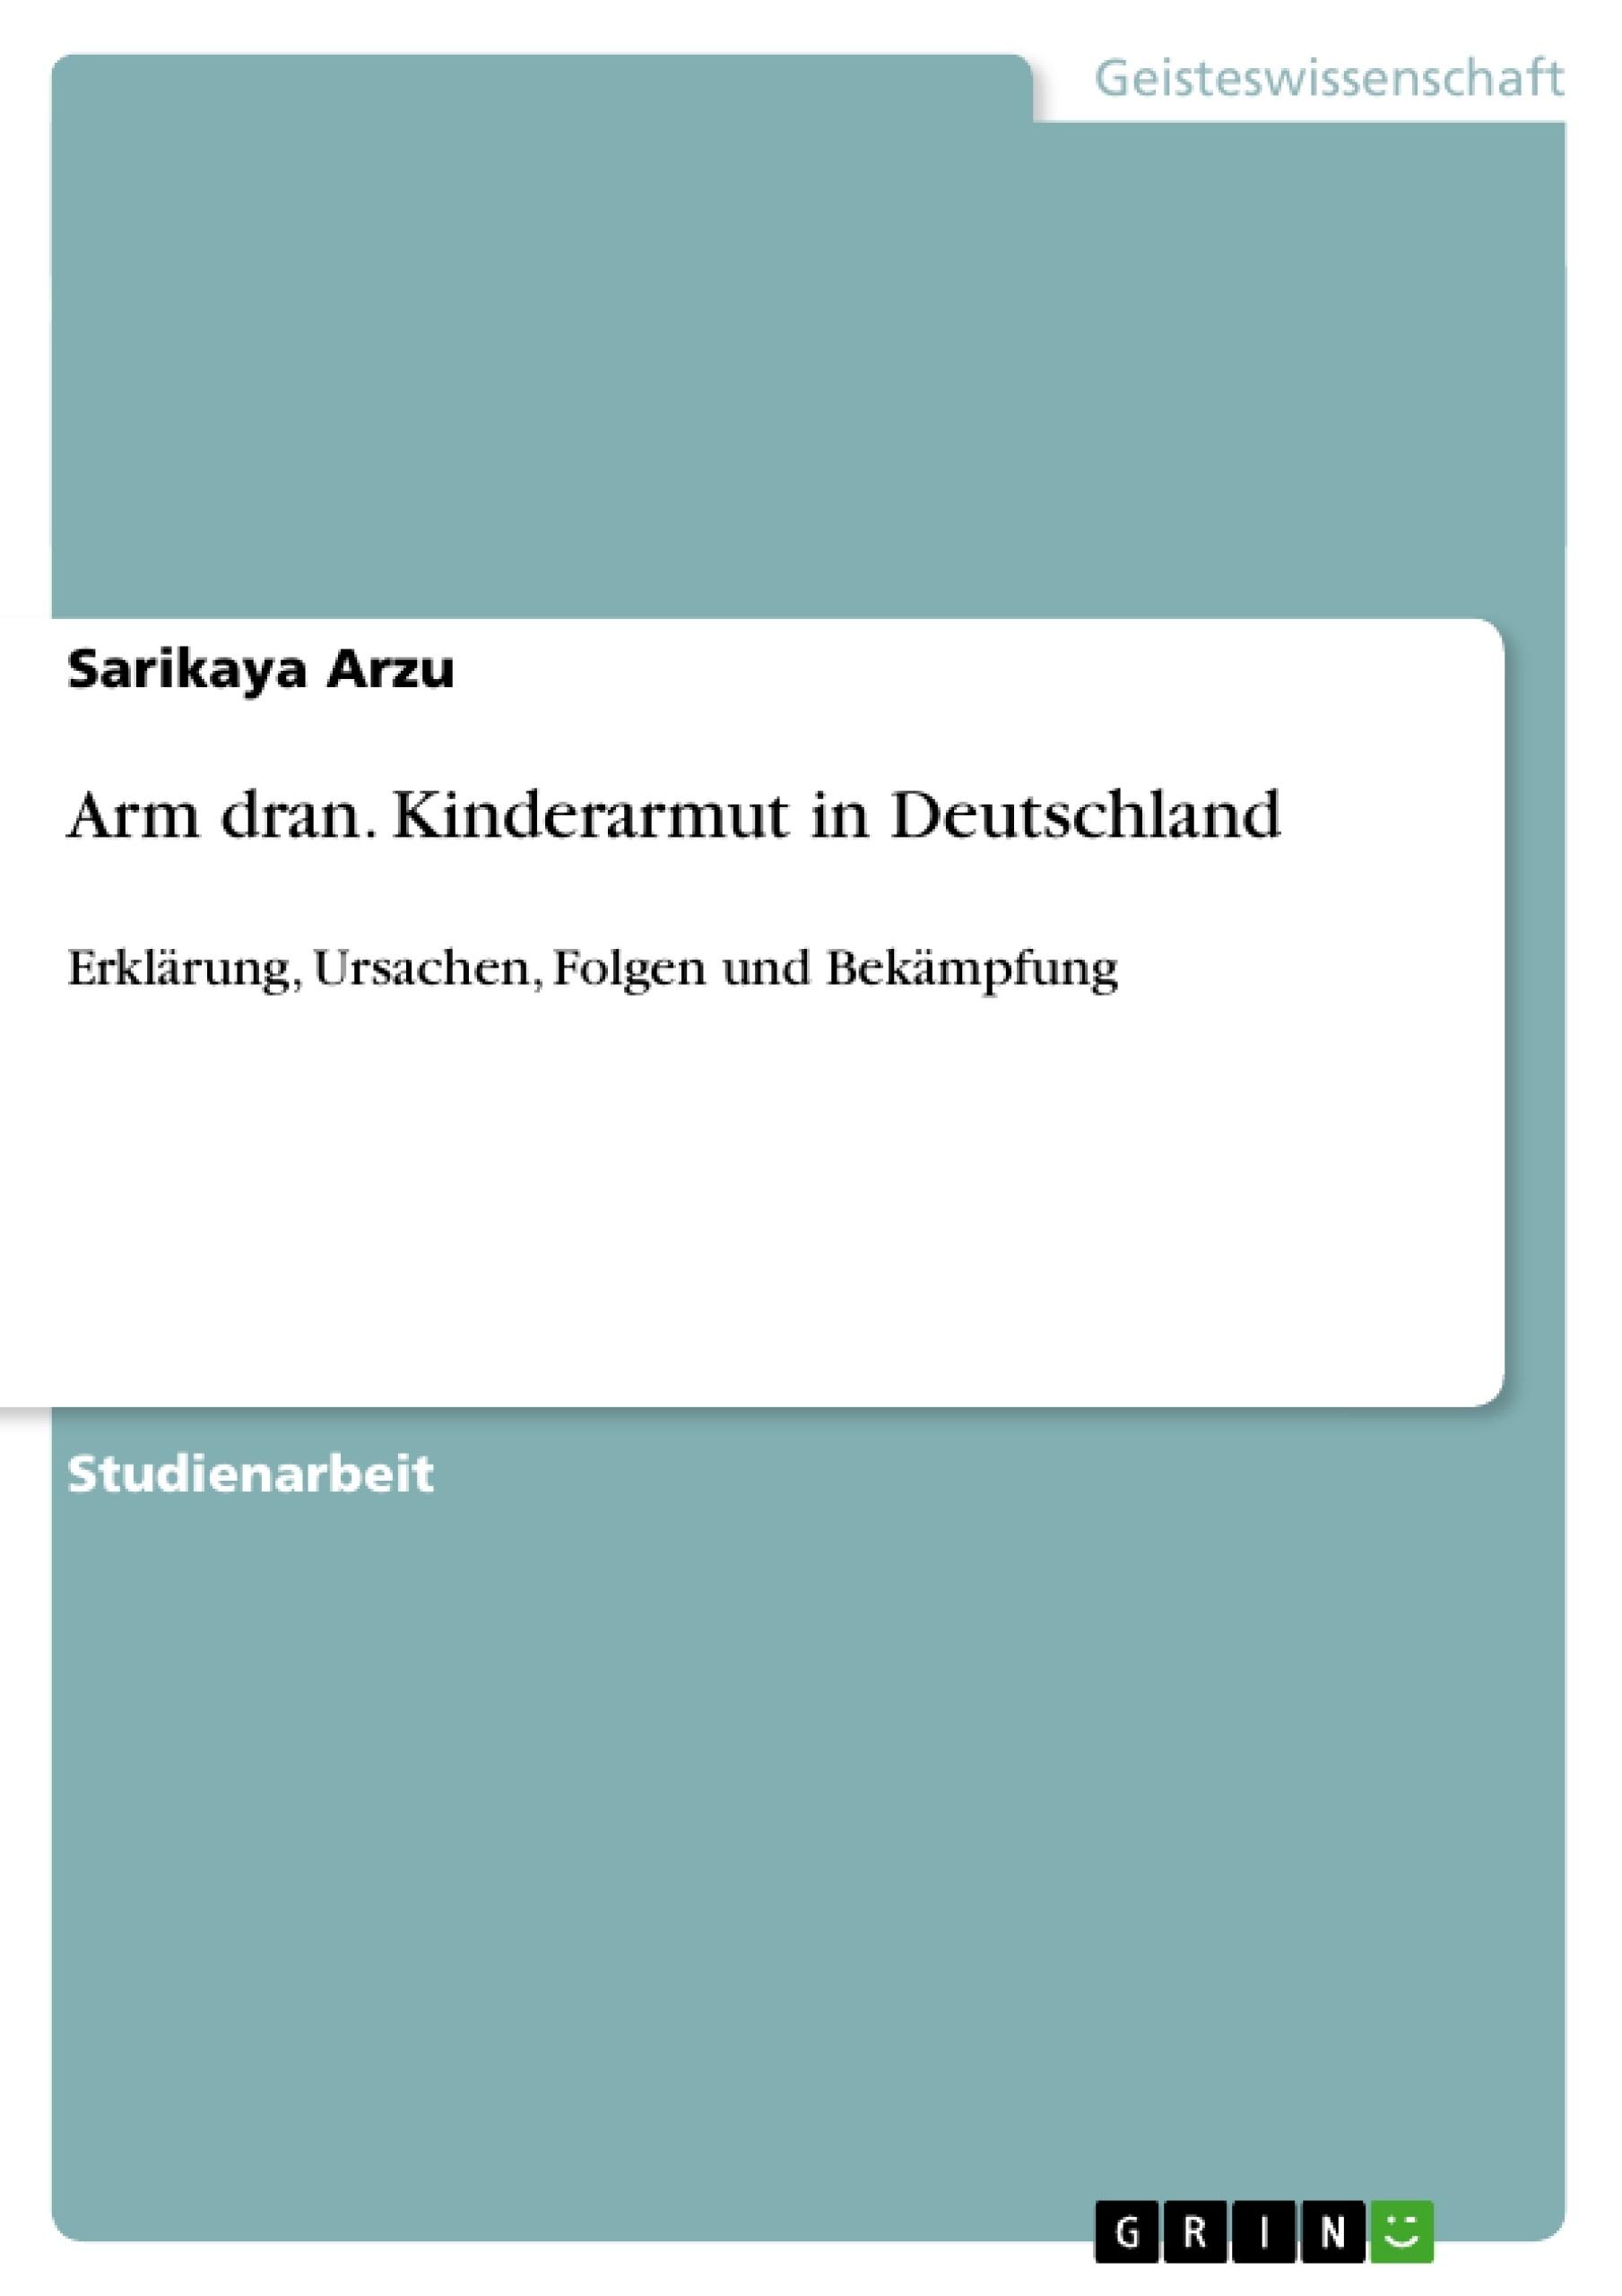 Titel: Arm dran. Kinderarmut in Deutschland